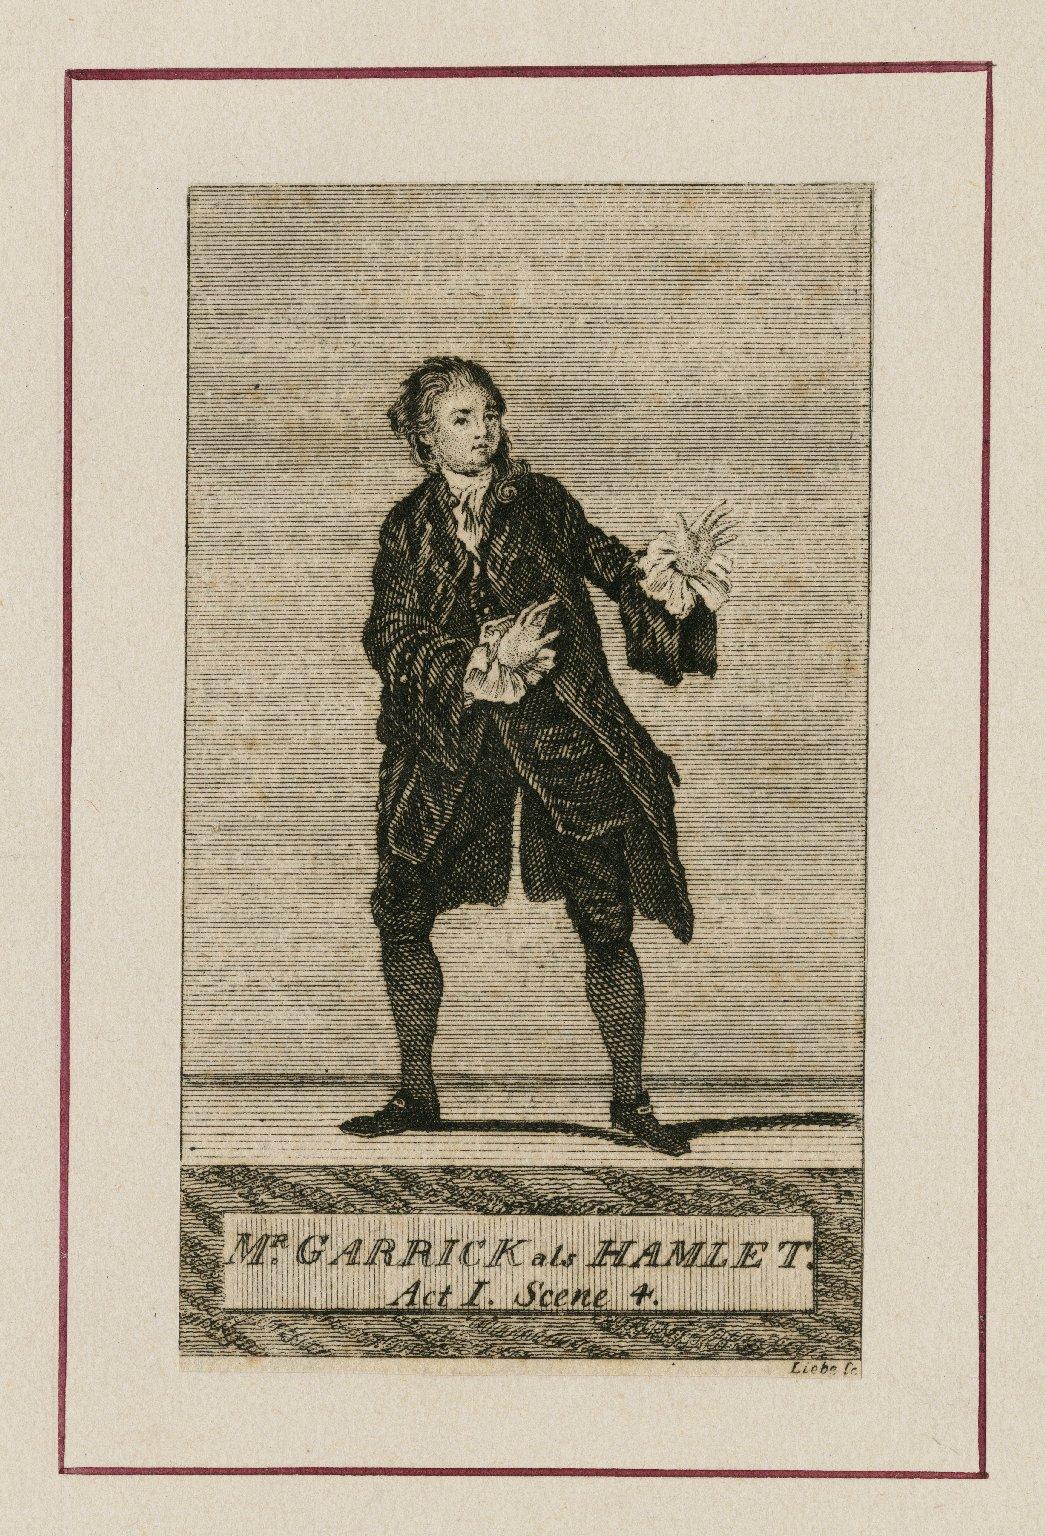 Mr. Garrick als Hamlet [in Shakespeare's Hamlet], act 1, scene 4 [graphic] / Liebe sc.